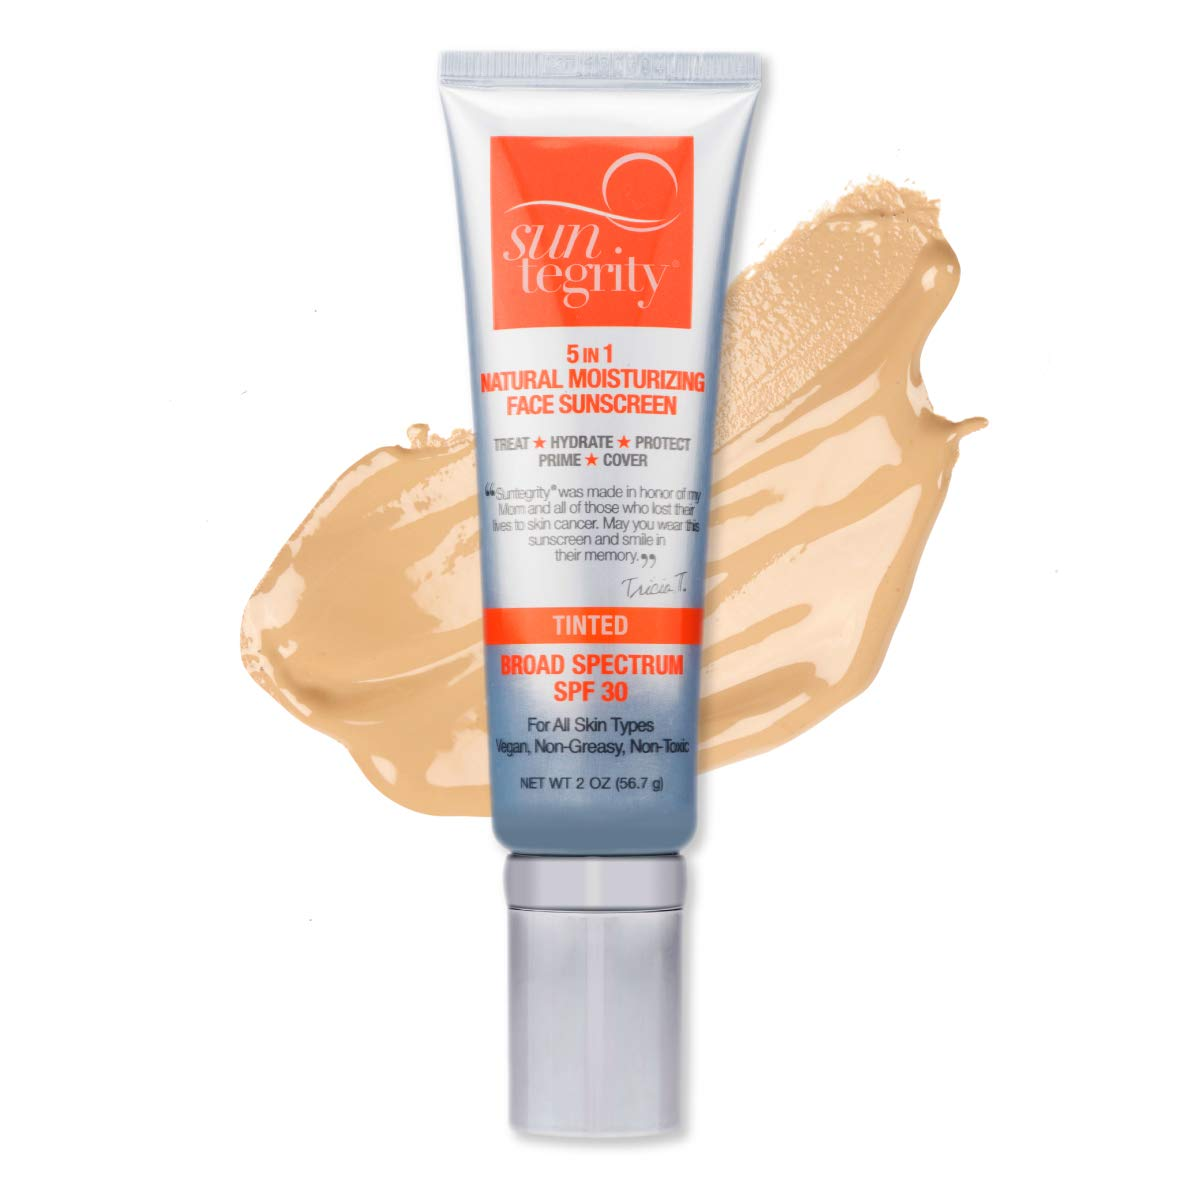 Suntegrity - ''5 in 1'' Natural Moisturizing Face Sunscreen - Tinted - GOLDEN LIGHT